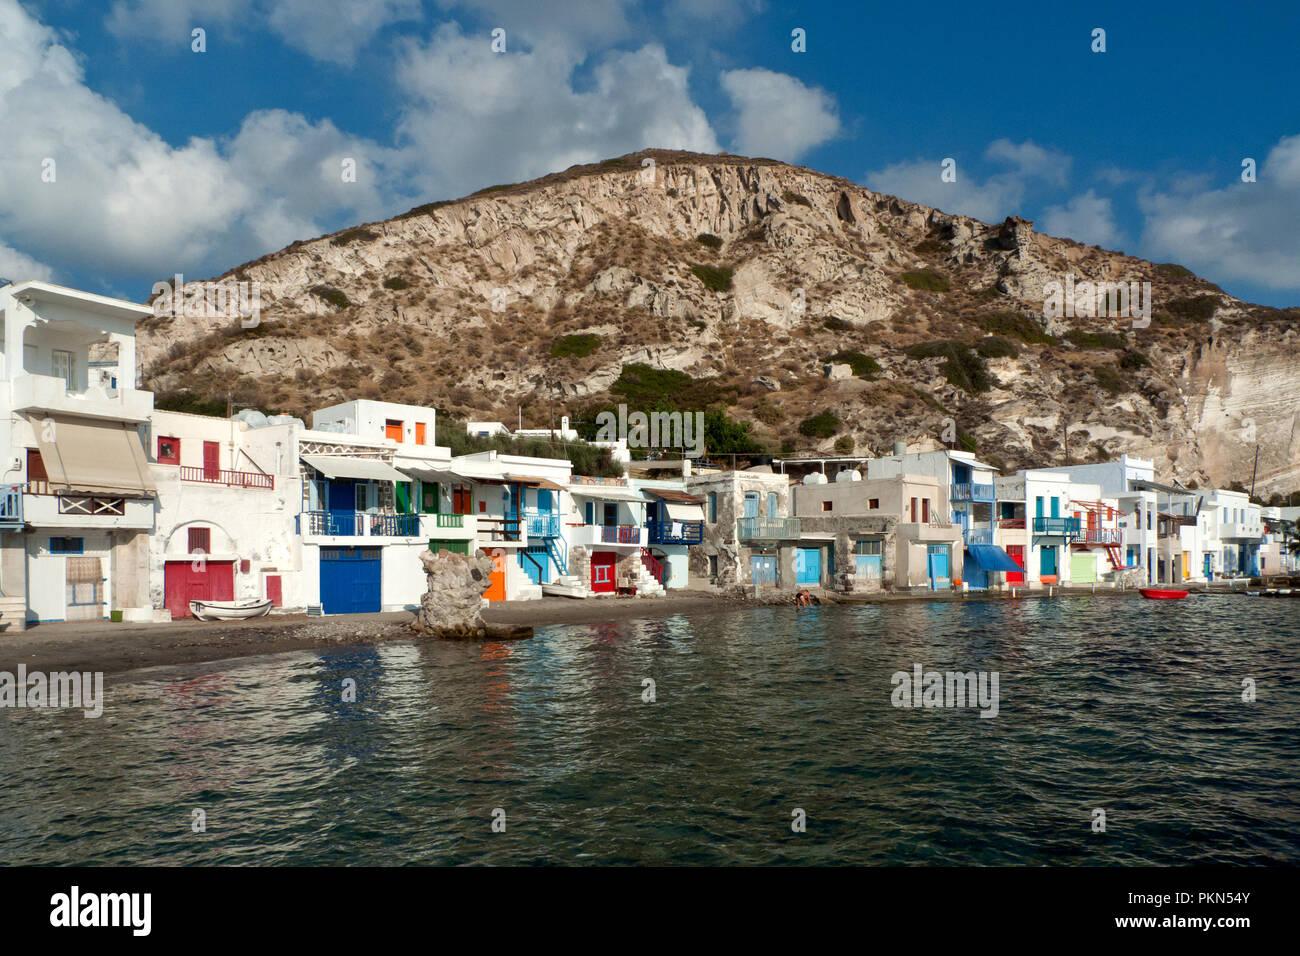 Milos, Klima village, Greece,09/13/2012: houses of Klima village - Stock Image